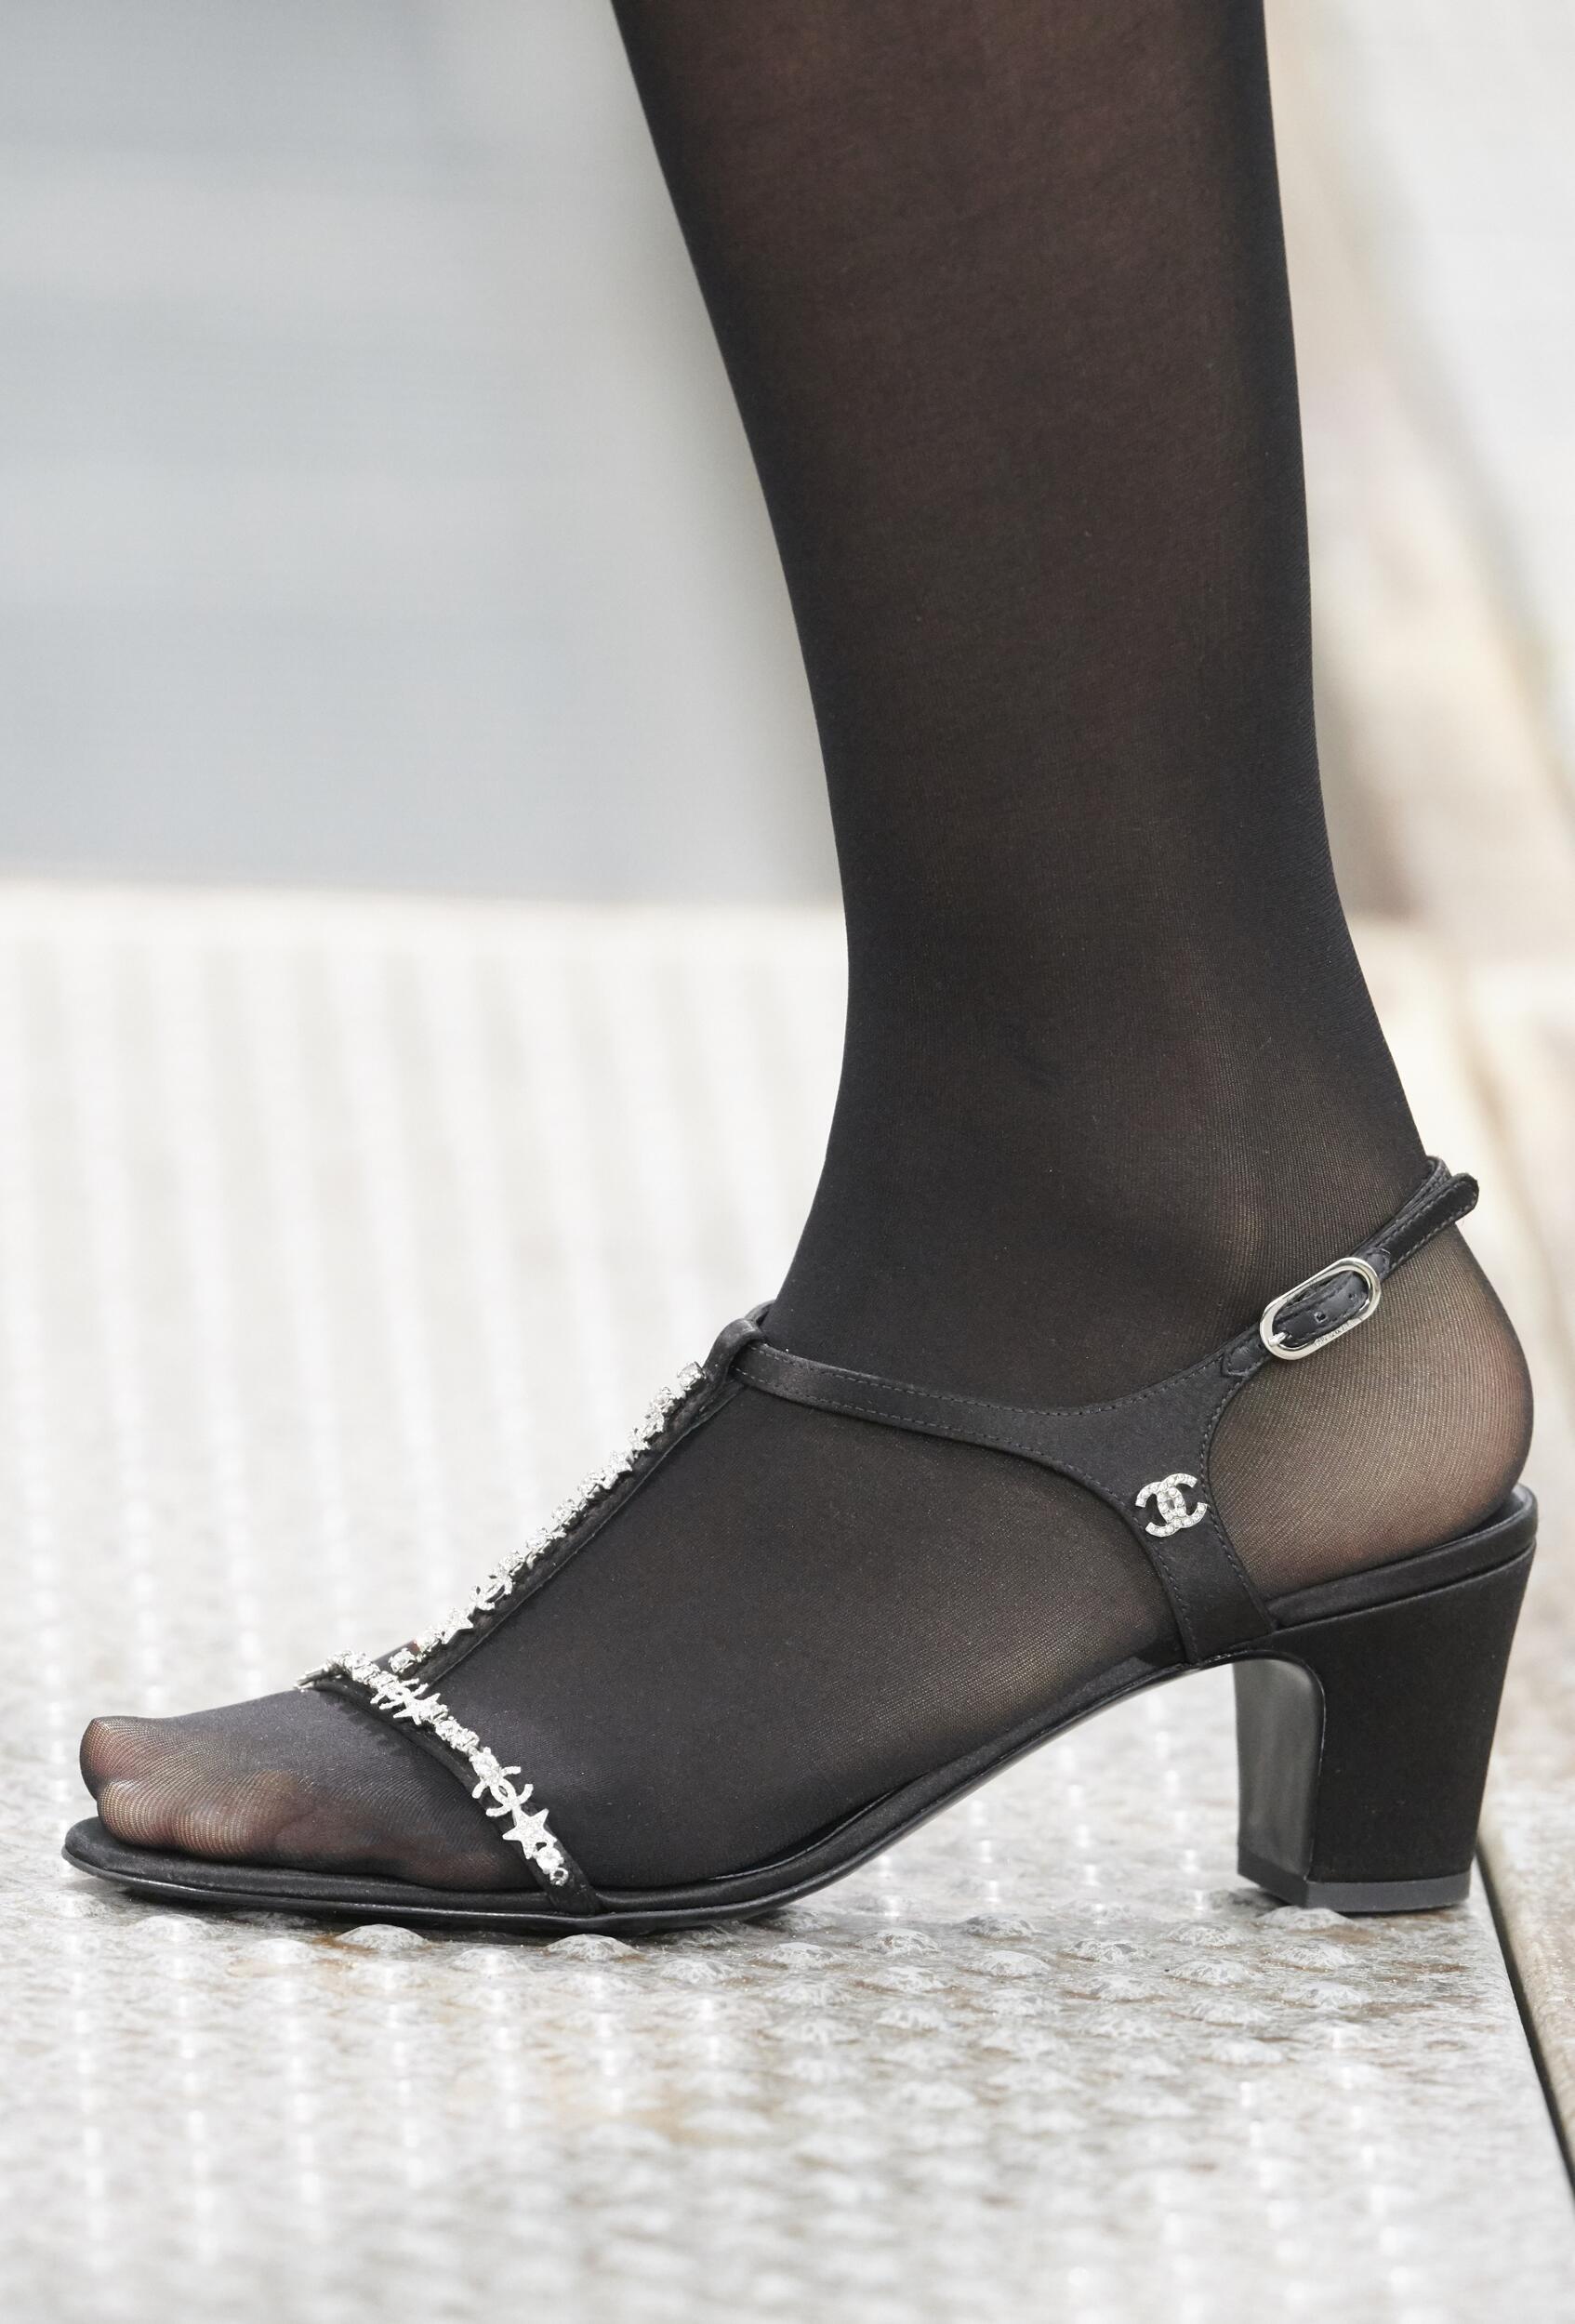 Chanel Spring Summer 2020 Shoe Detail